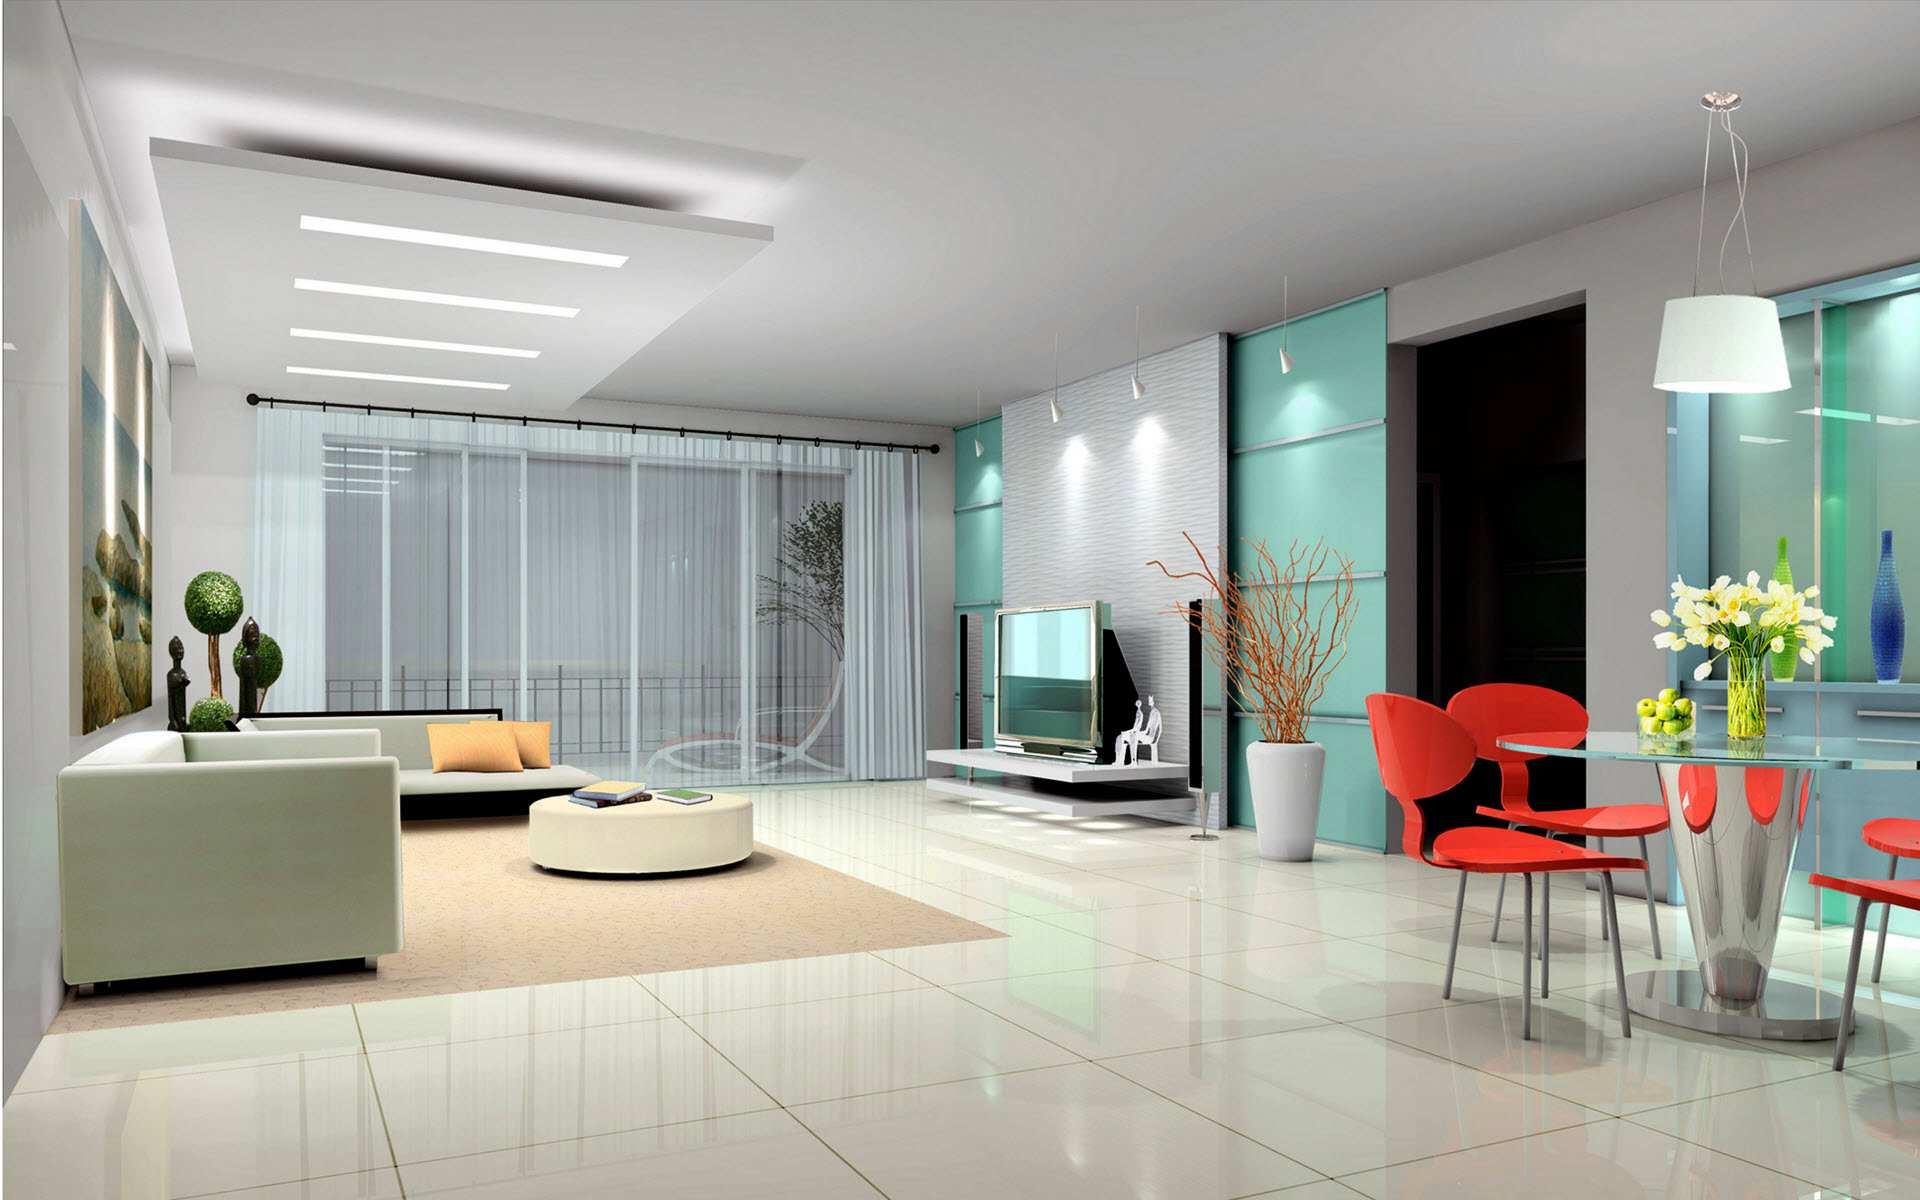 Interior Design For My Home - Interior design my house